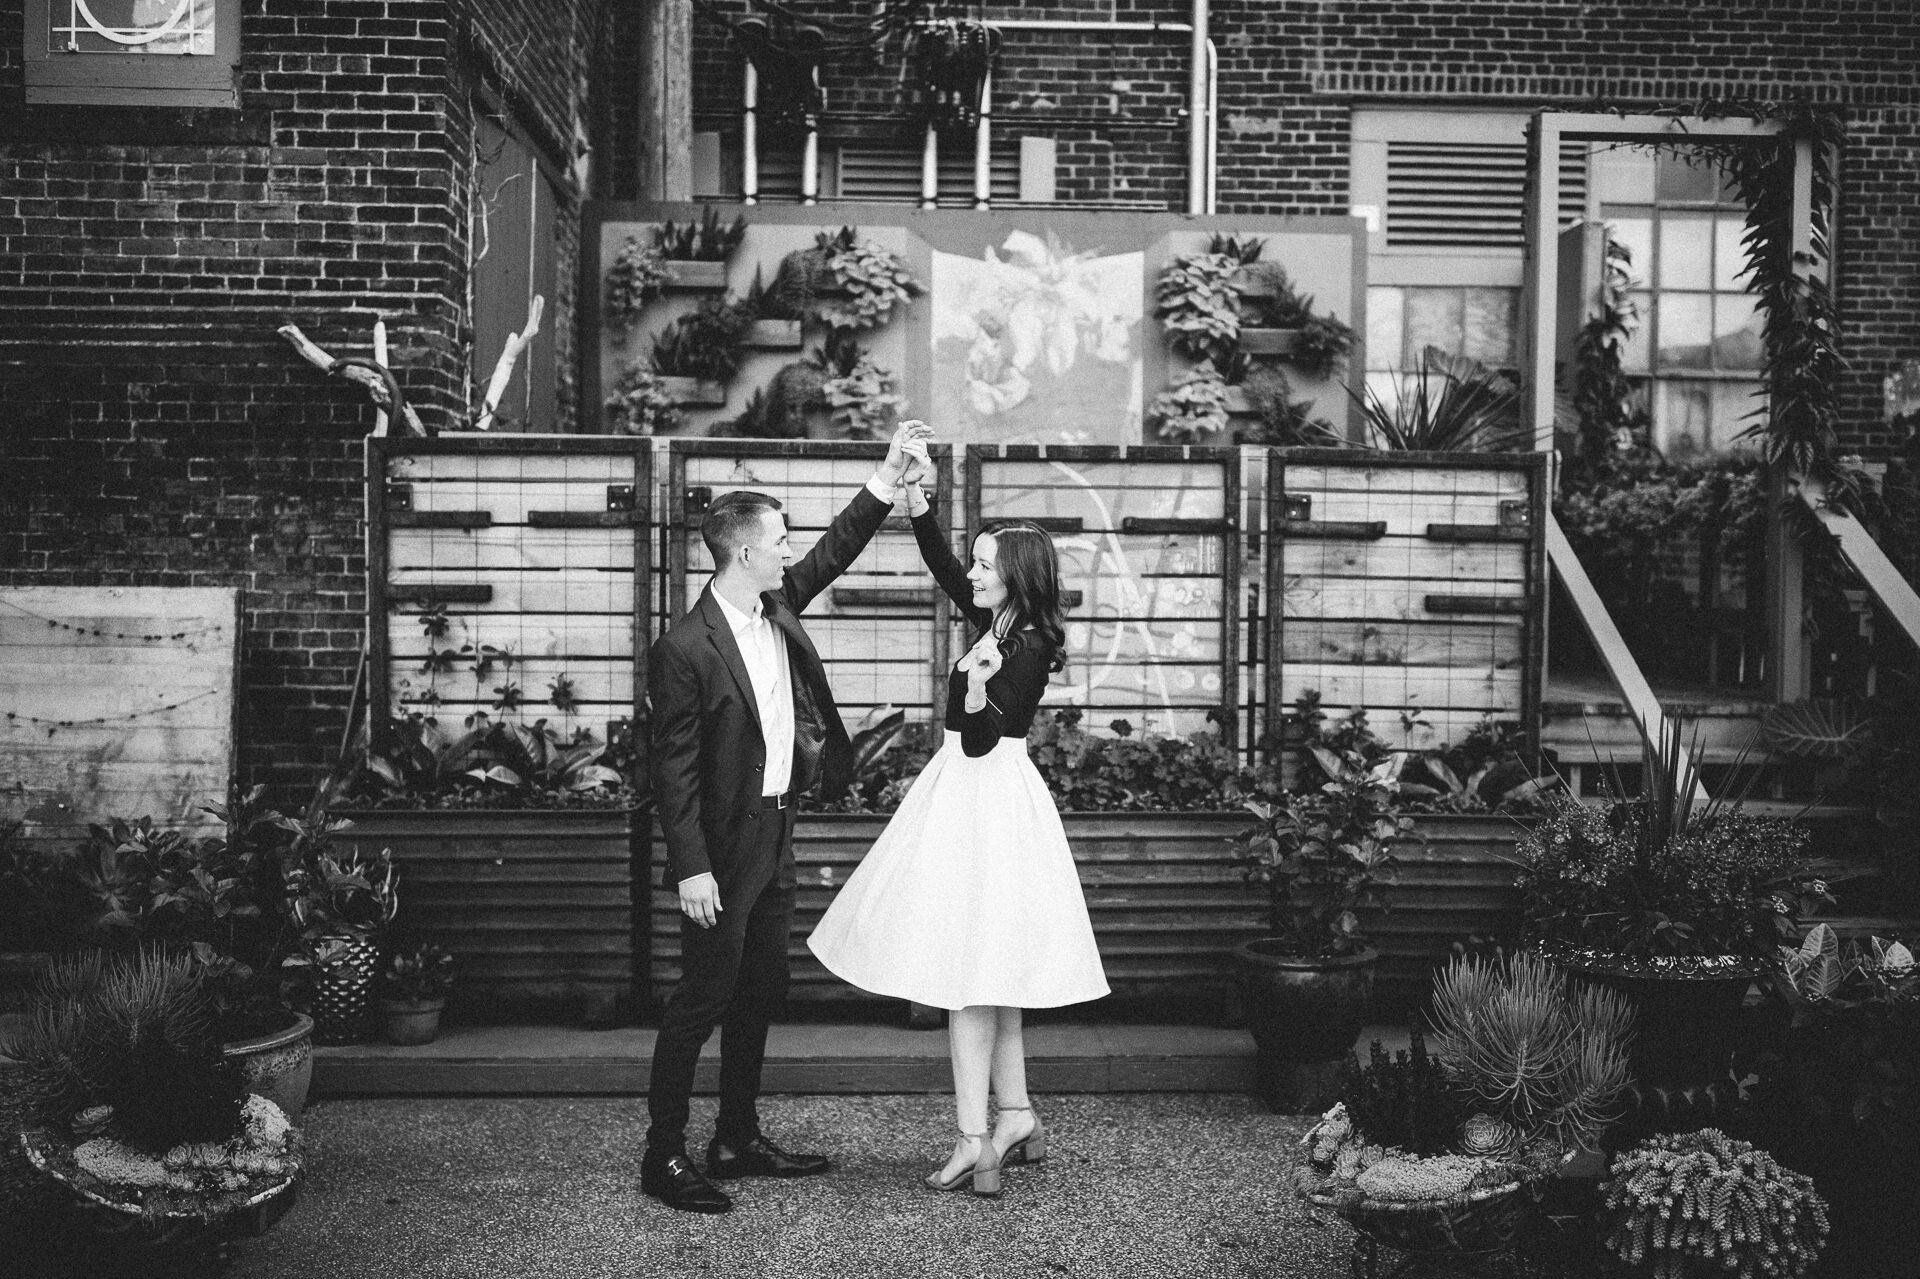 78th Street Studio Engagement and Wedding Photographer 7.jpg